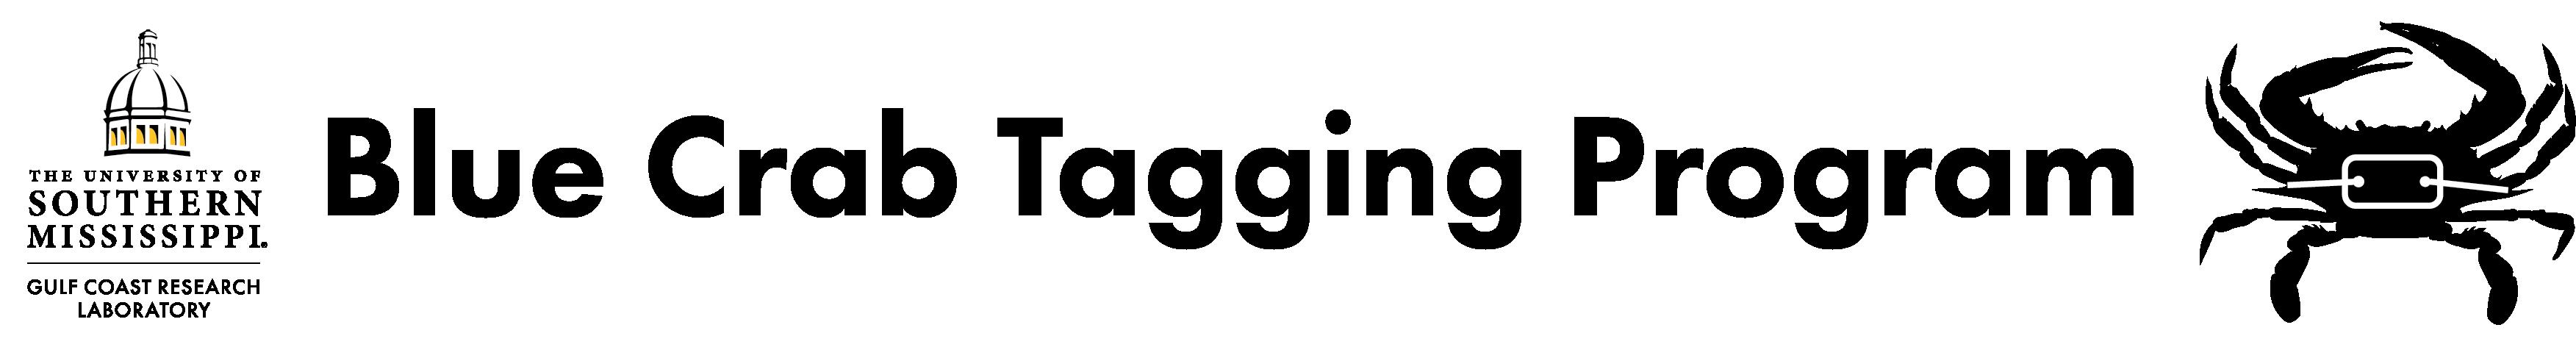 Blue Crab Tagging Program Logo